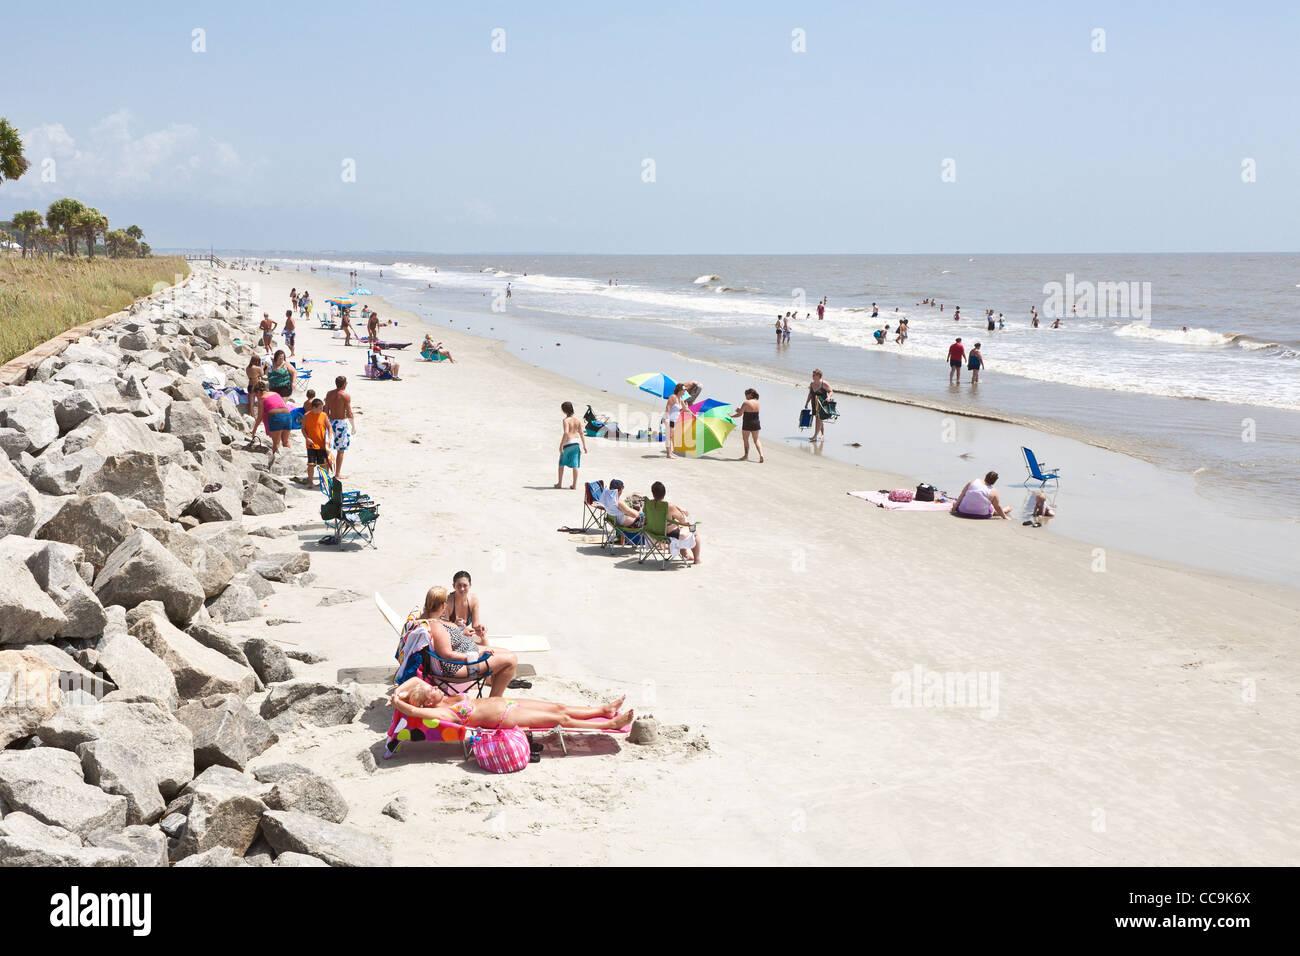 Sunbathers and colorful beach umbrellas on the public beach at Jekyll Island, Georgia. - Stock Image